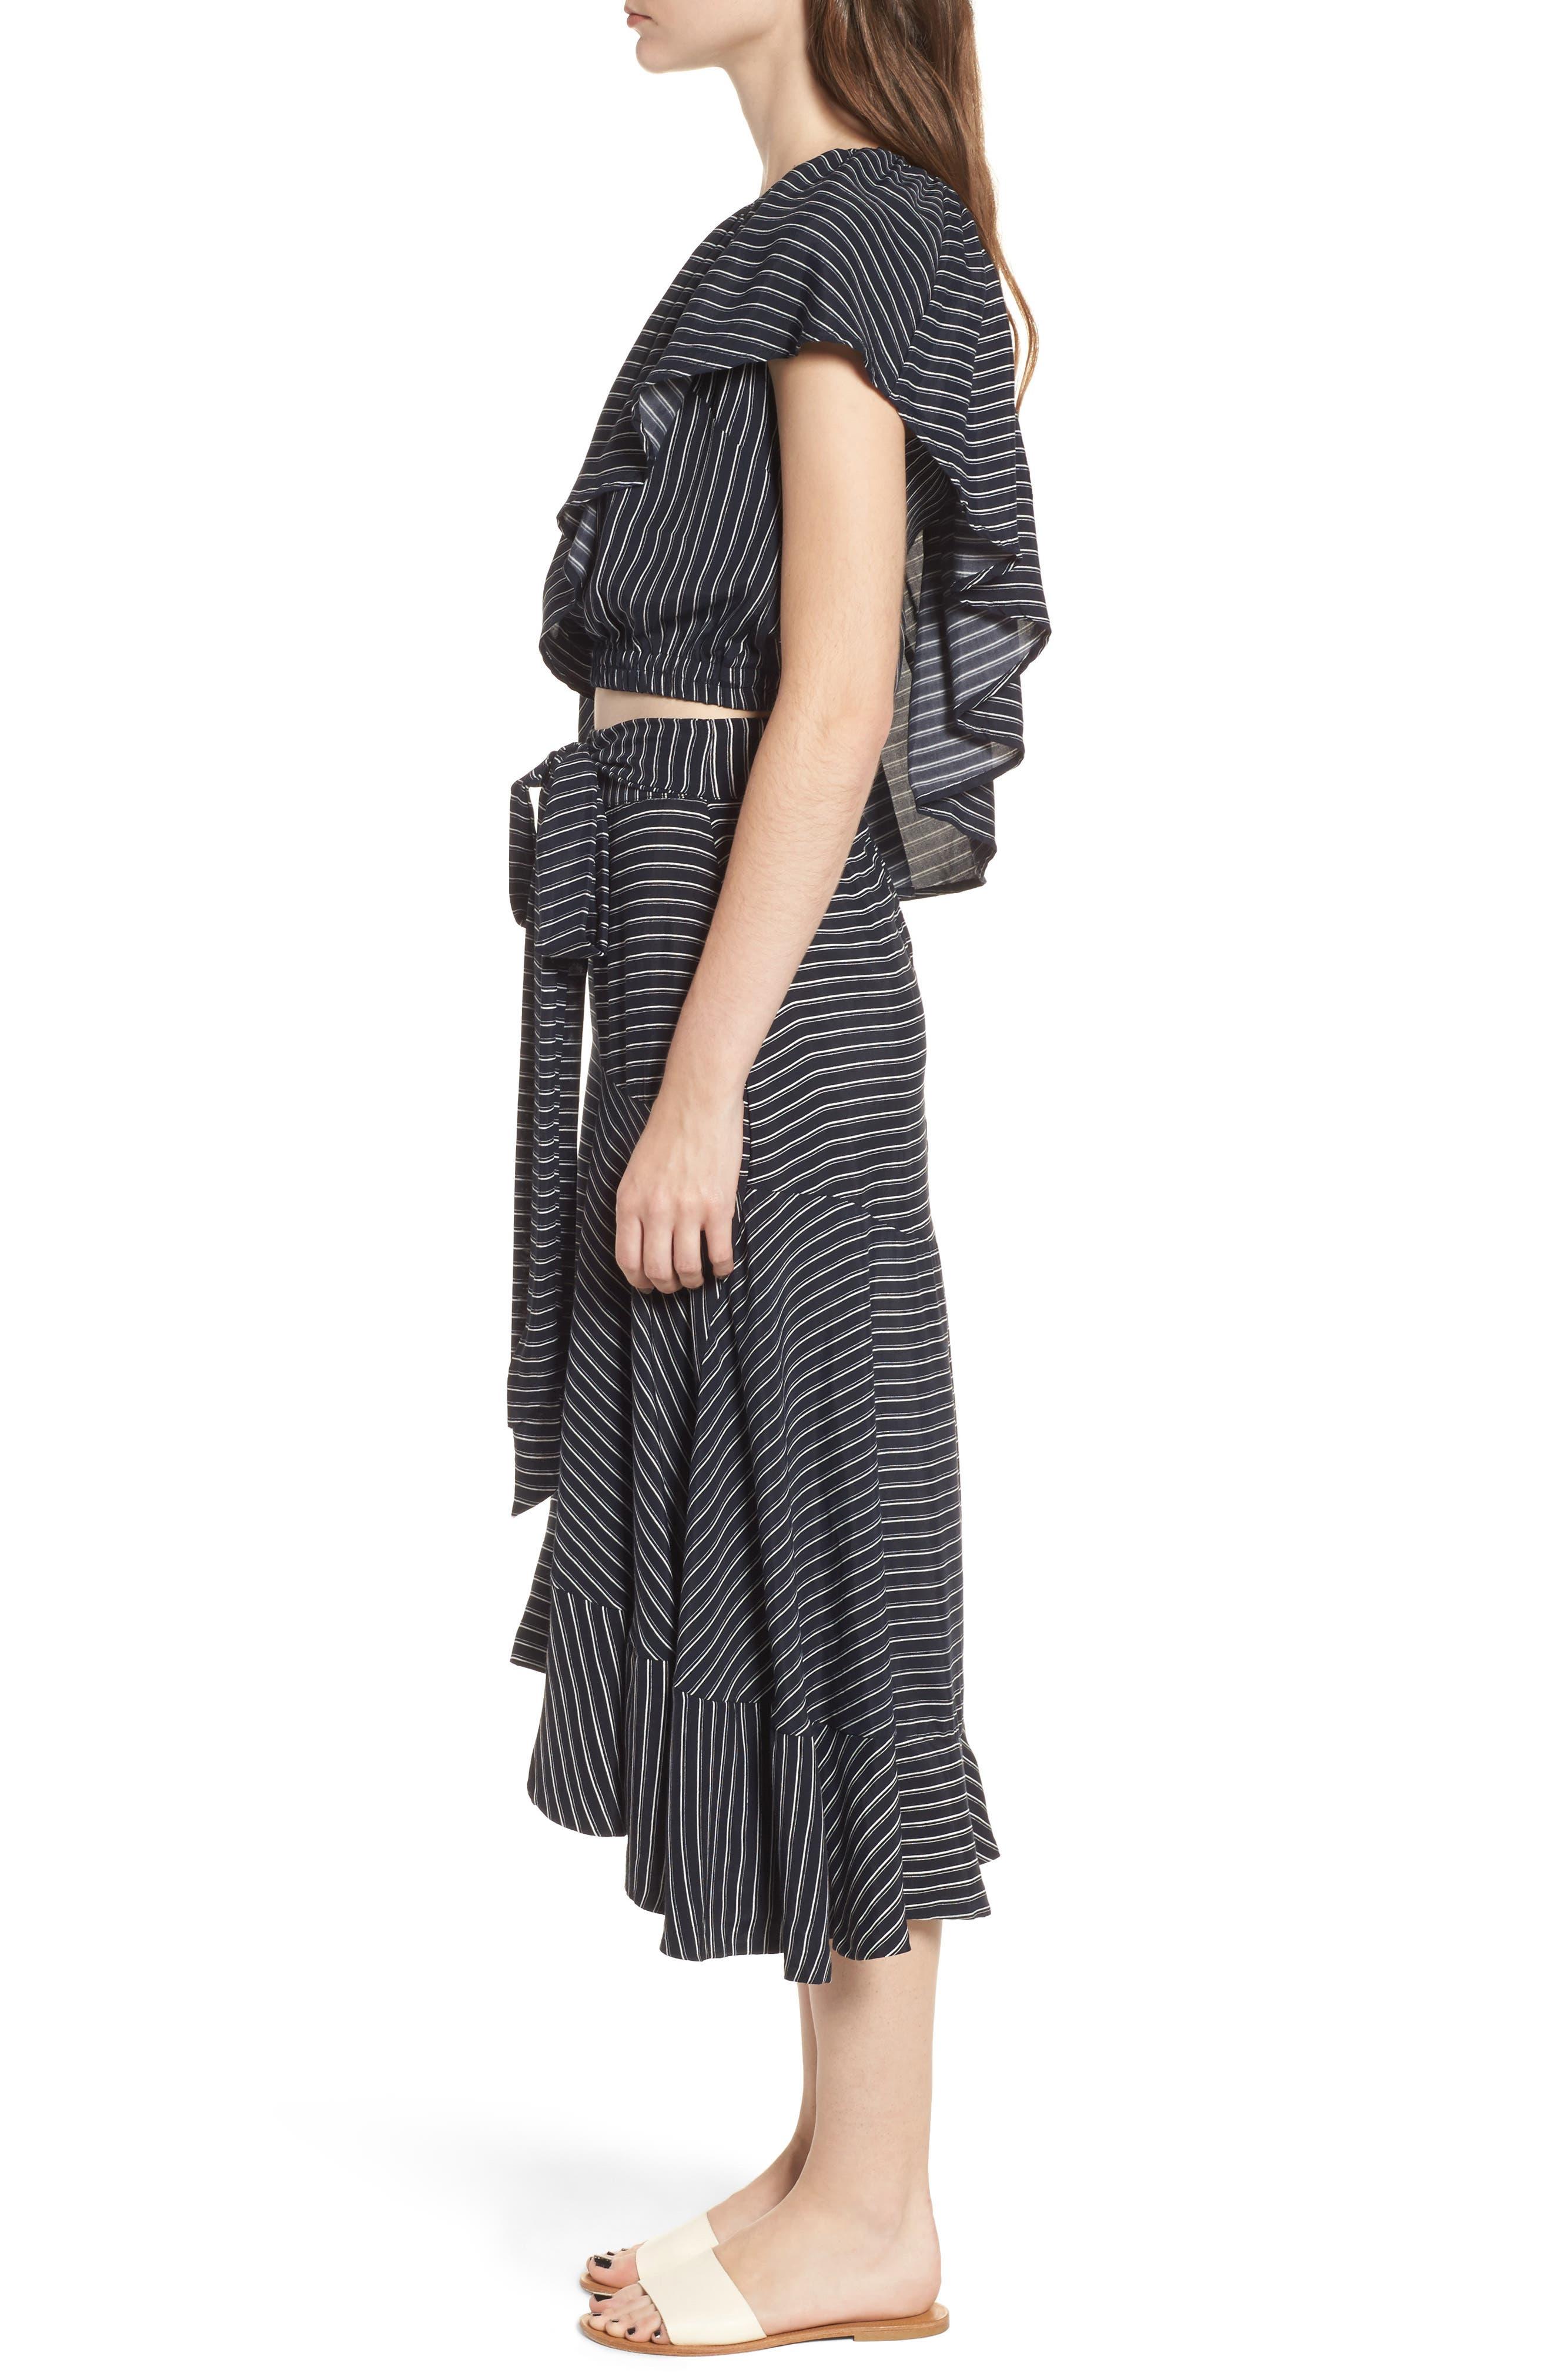 Kamares Ruffle Midi Skirt,                             Alternate thumbnail 9, color,                             001